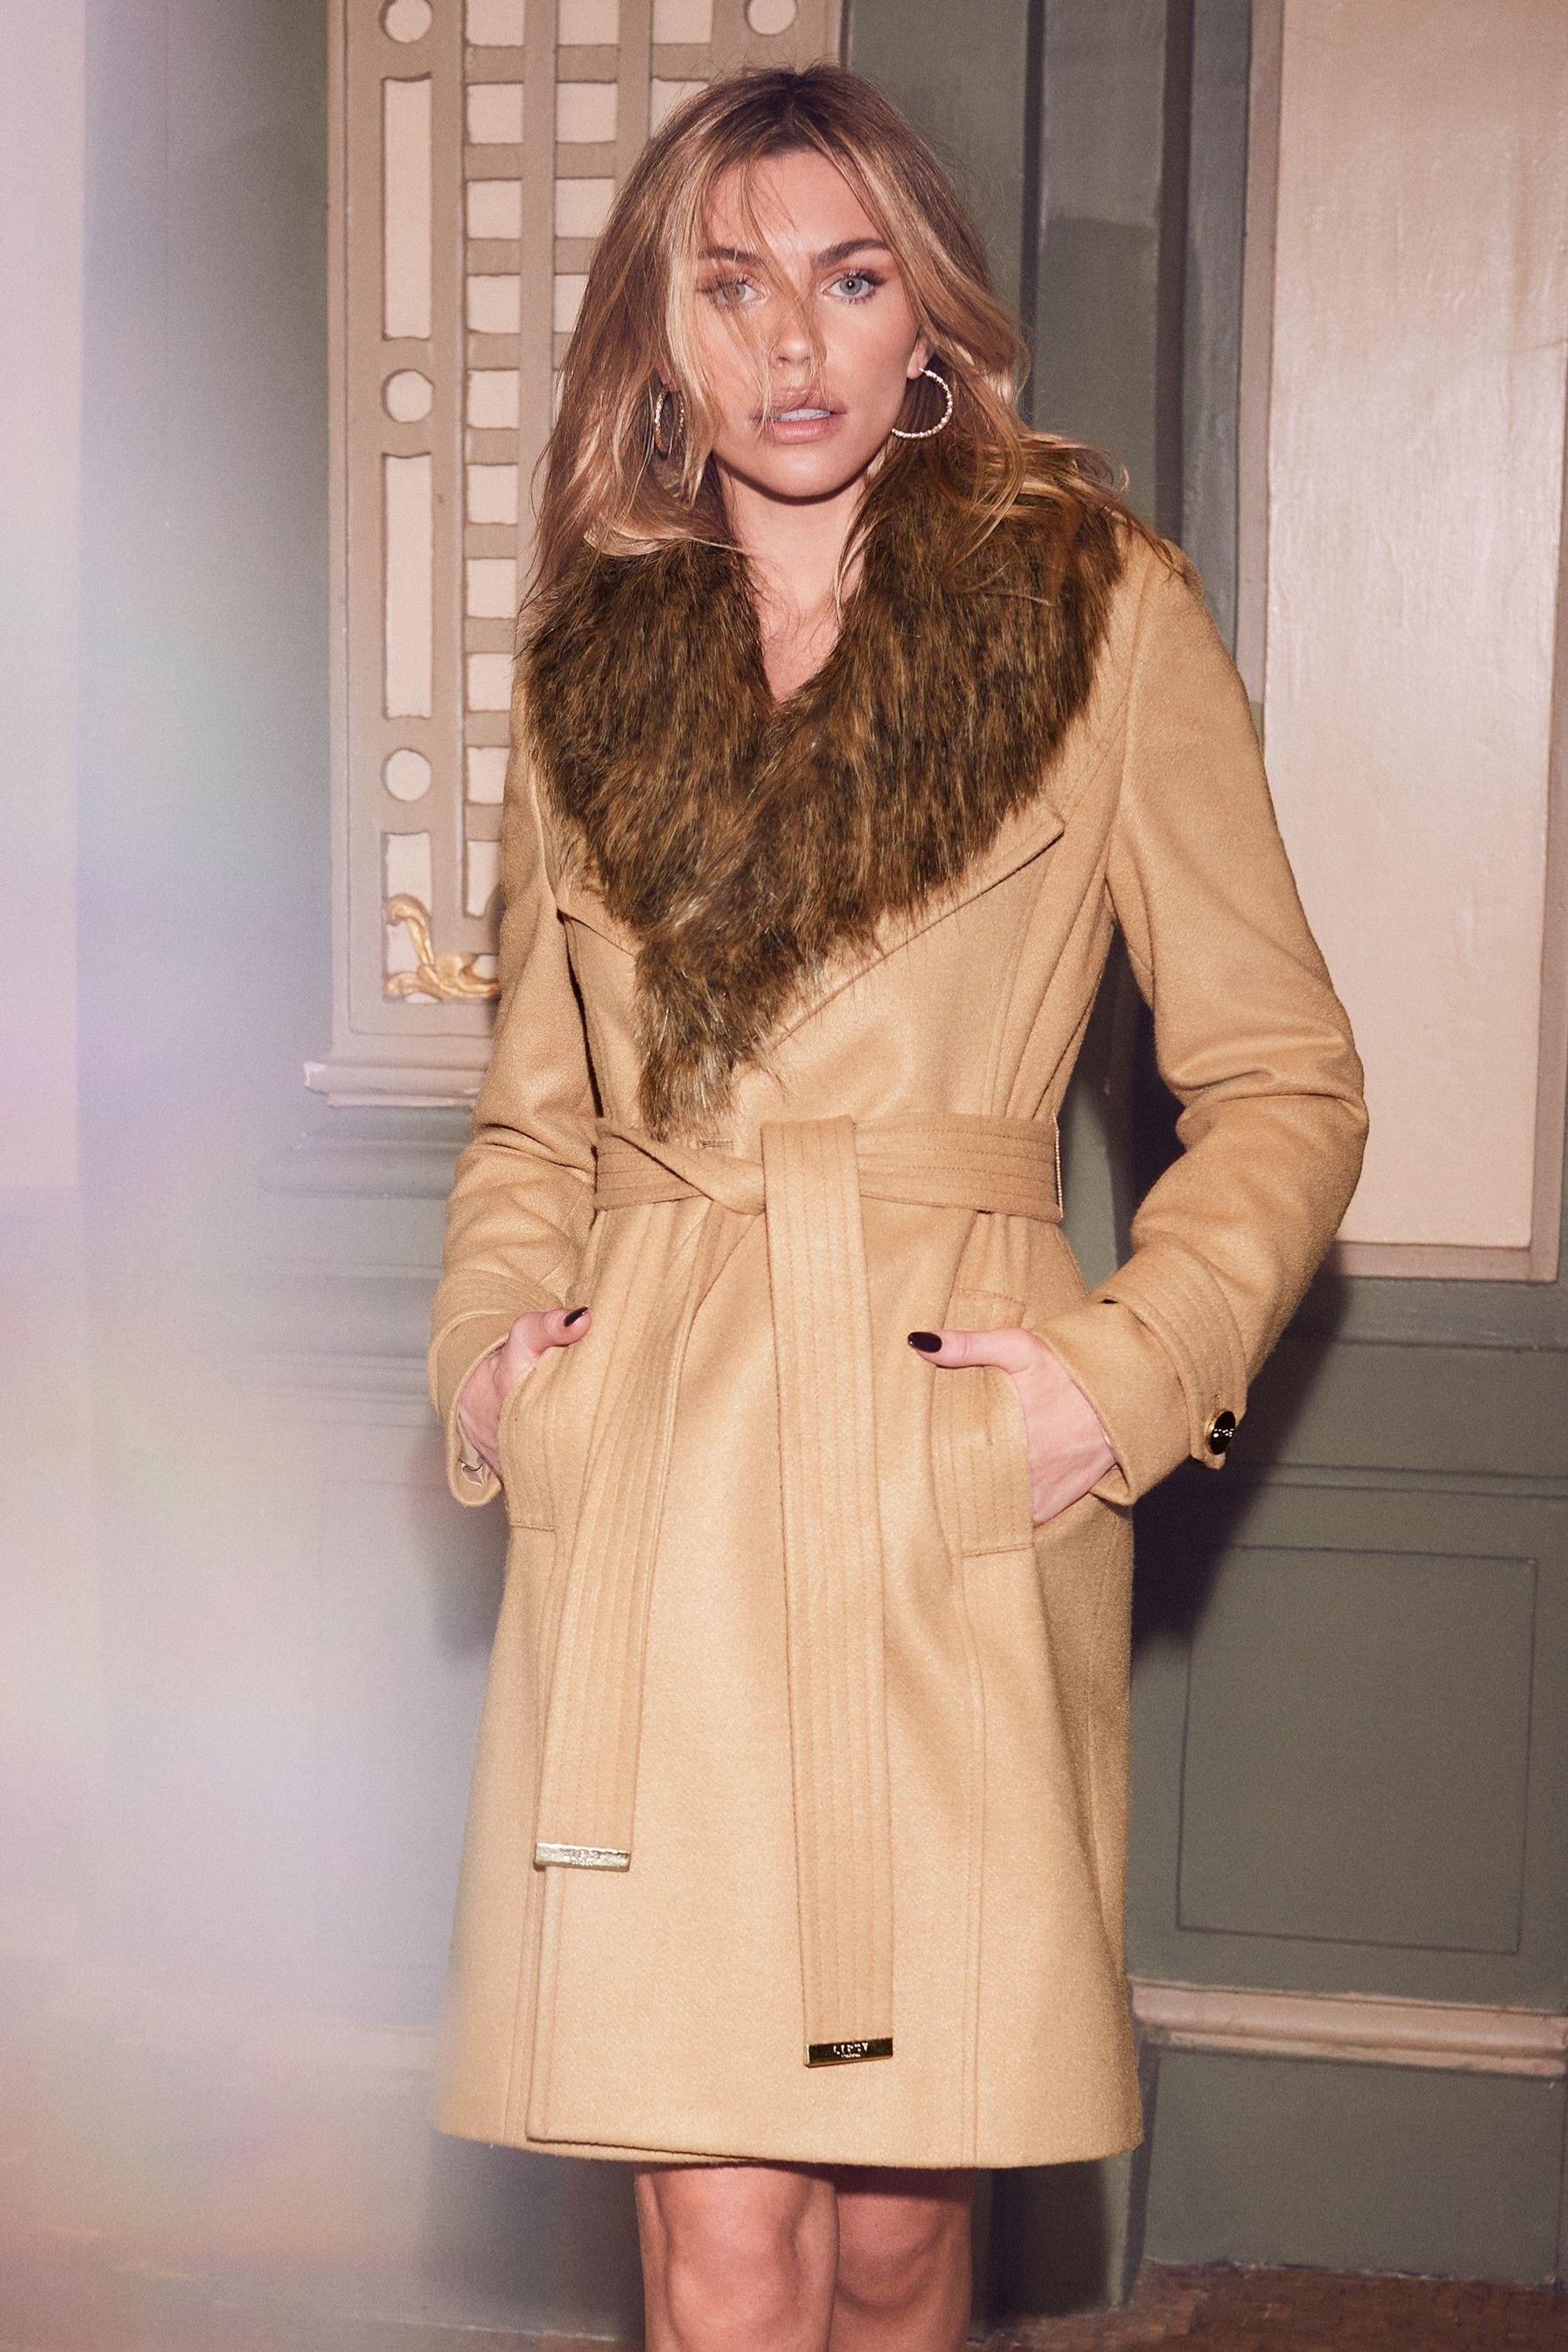 81227c365c576 Womens Abbey Clancy x Lipsy Faux Fur Collar Wrap Coat - Tan ...